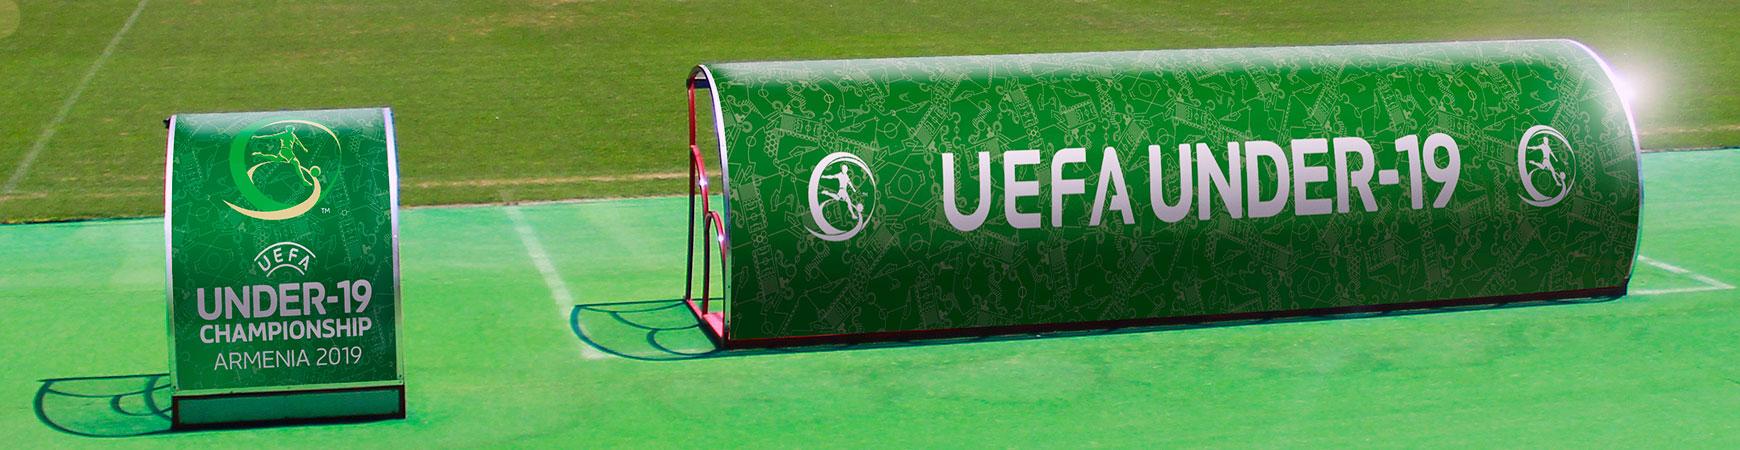 uefa championship stadium canopy signs